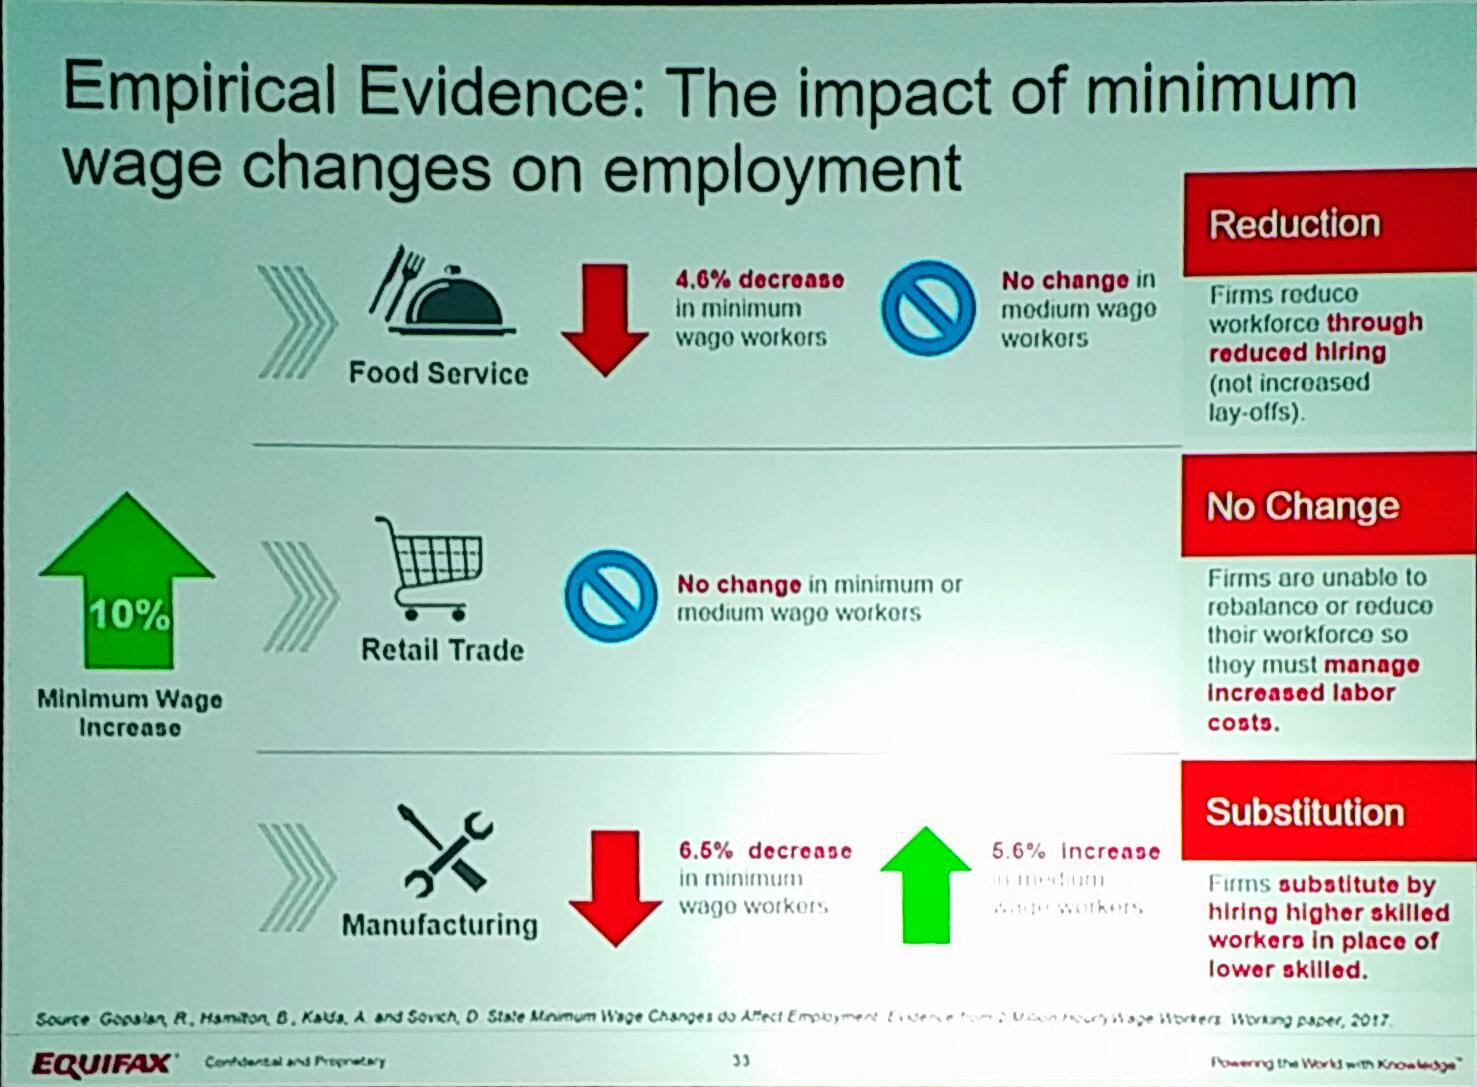 .@nhamdi - Minimum wage increases handled different between industries - but always hurts minimum wage workers. #EFXForum17 https://t.co/rYFnA50dgb